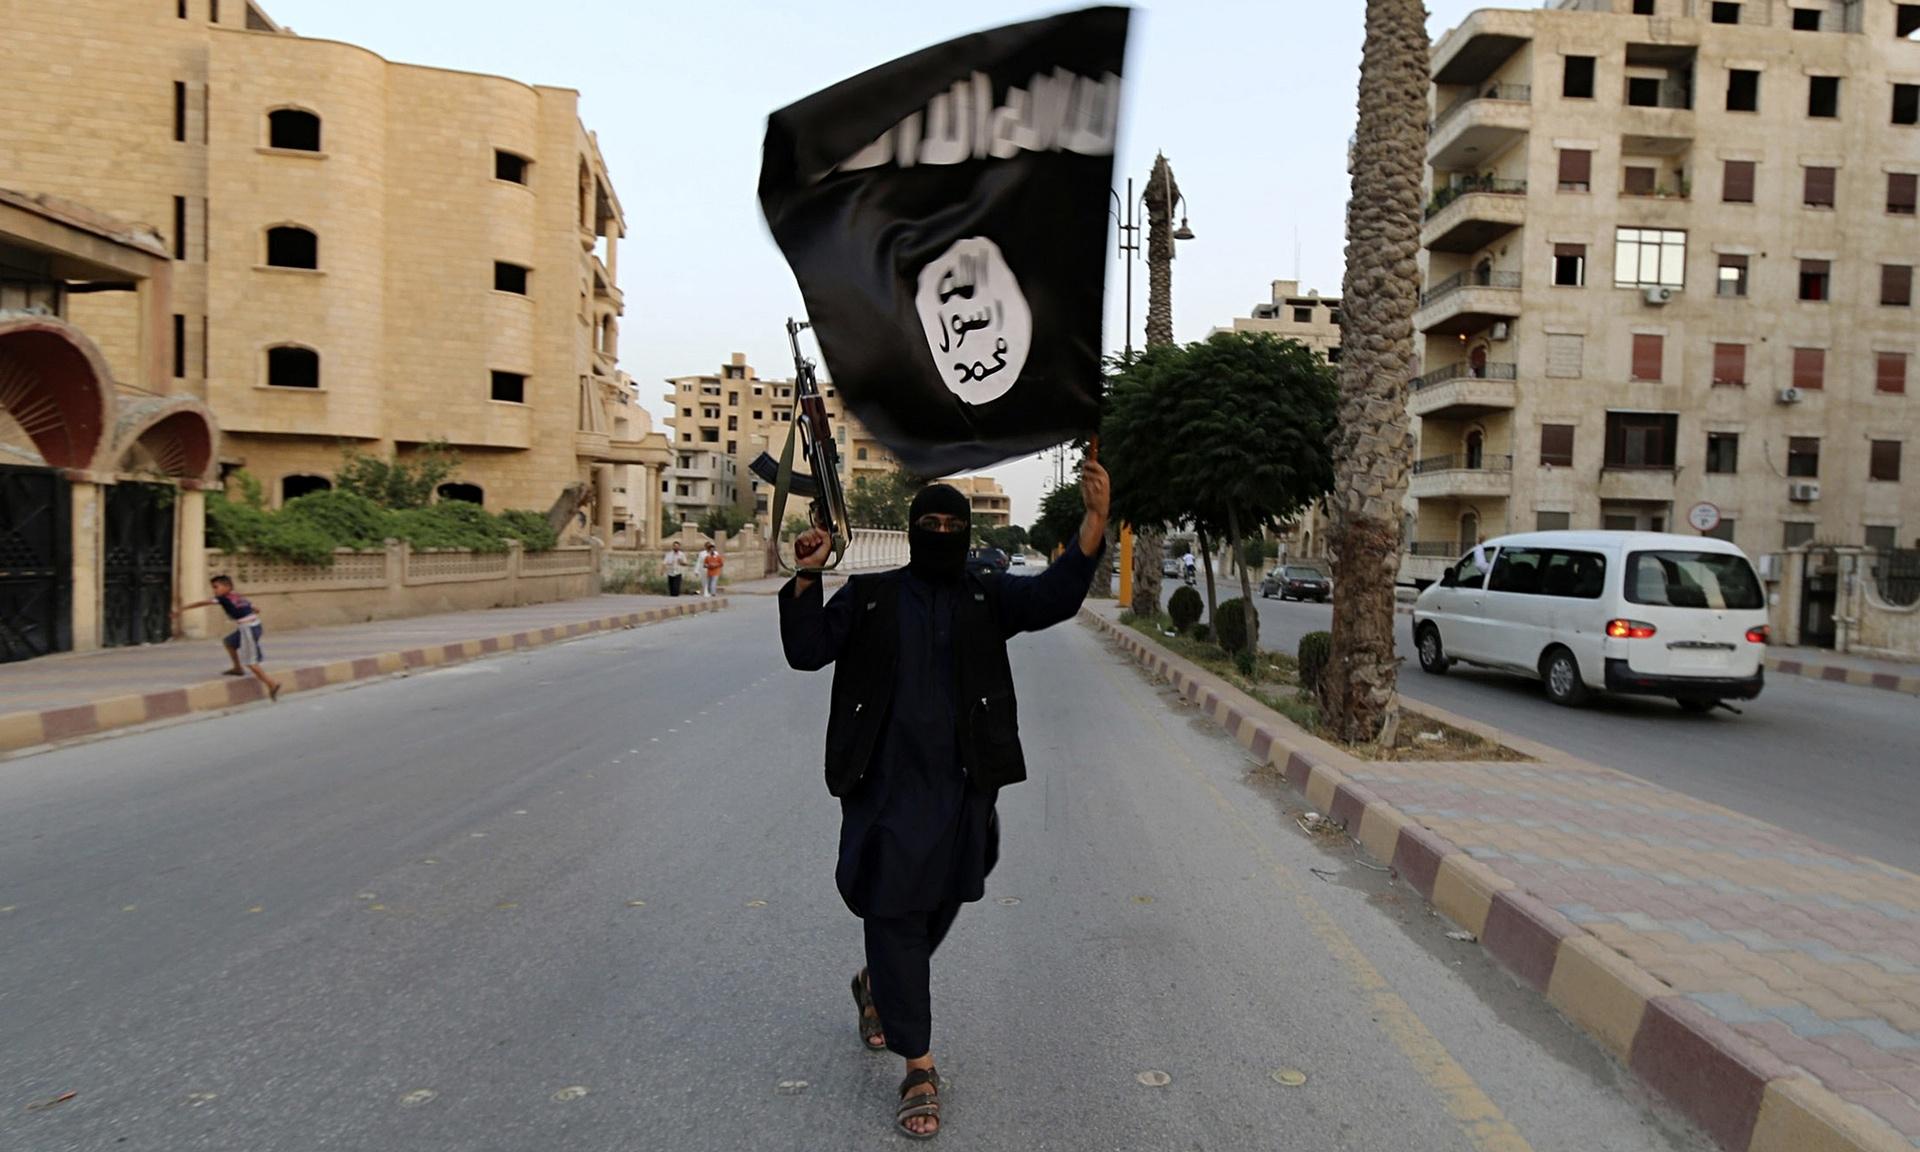 OTKRIVAMO: Krvavi trag tzv. Islamske države - koliko je nedužnih stradalo?